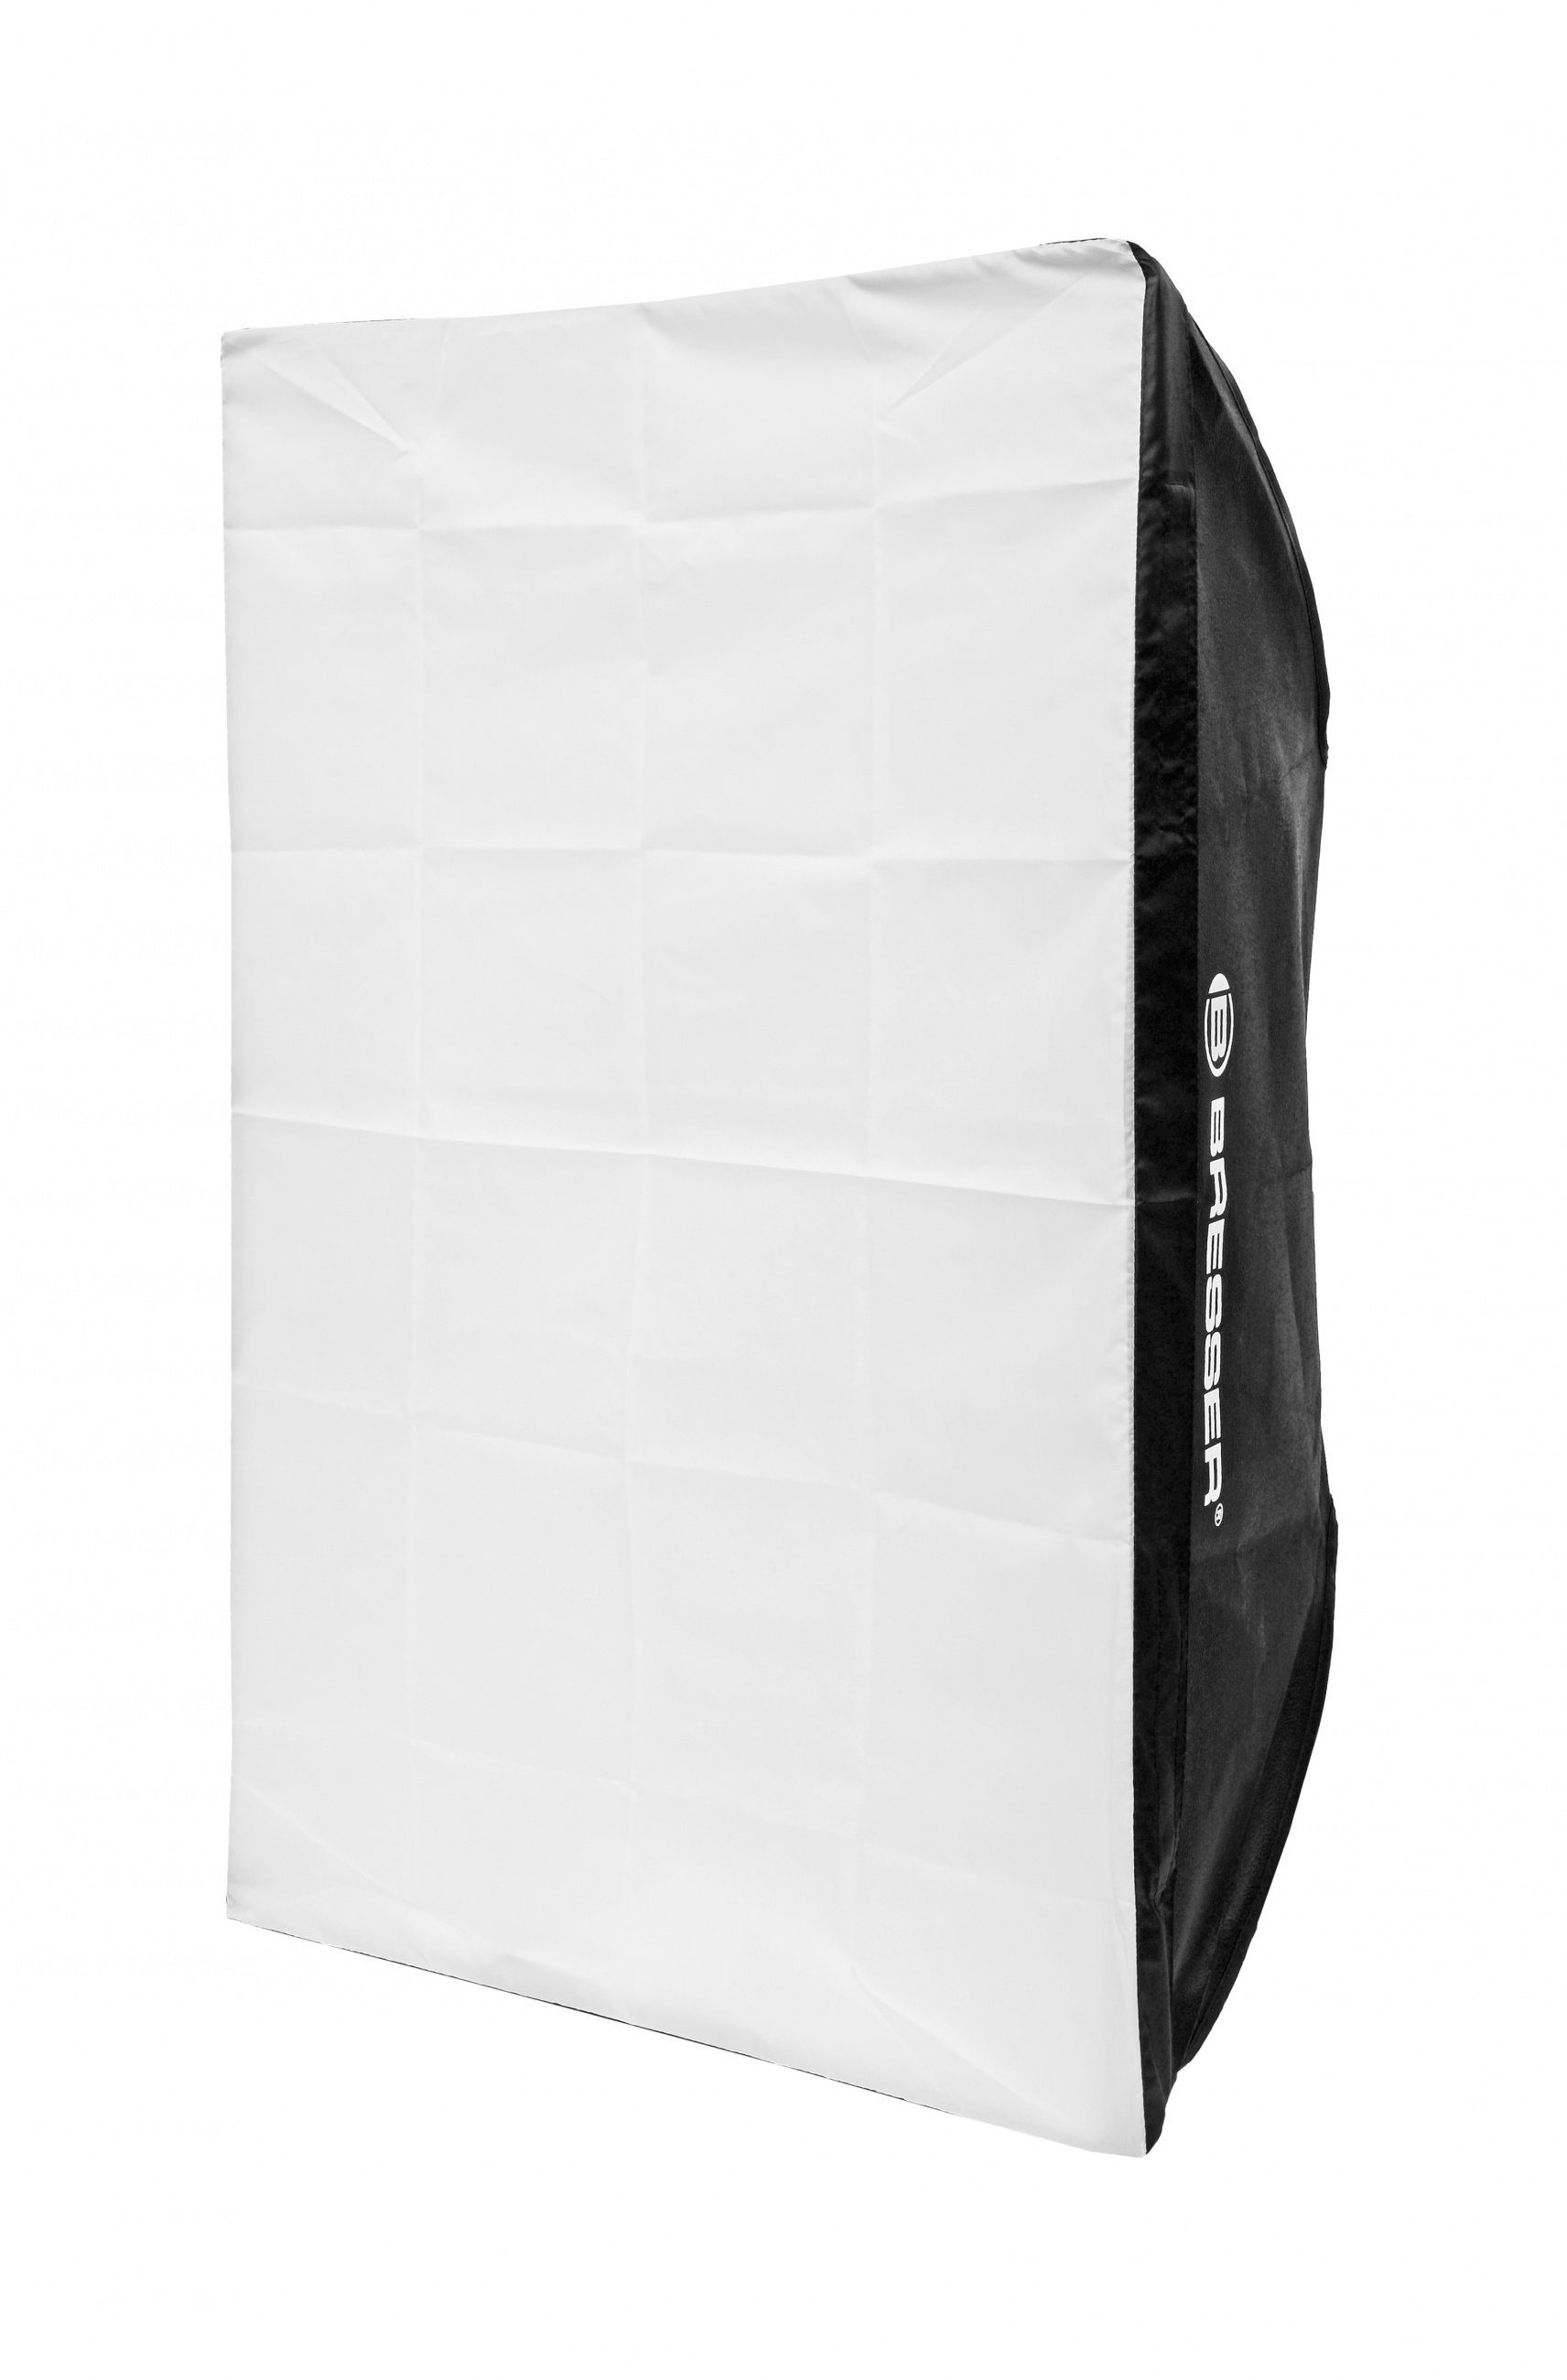 BRESSER Fotostudio »BRESSER SS-1 Softbox High Grade 80x60cm«